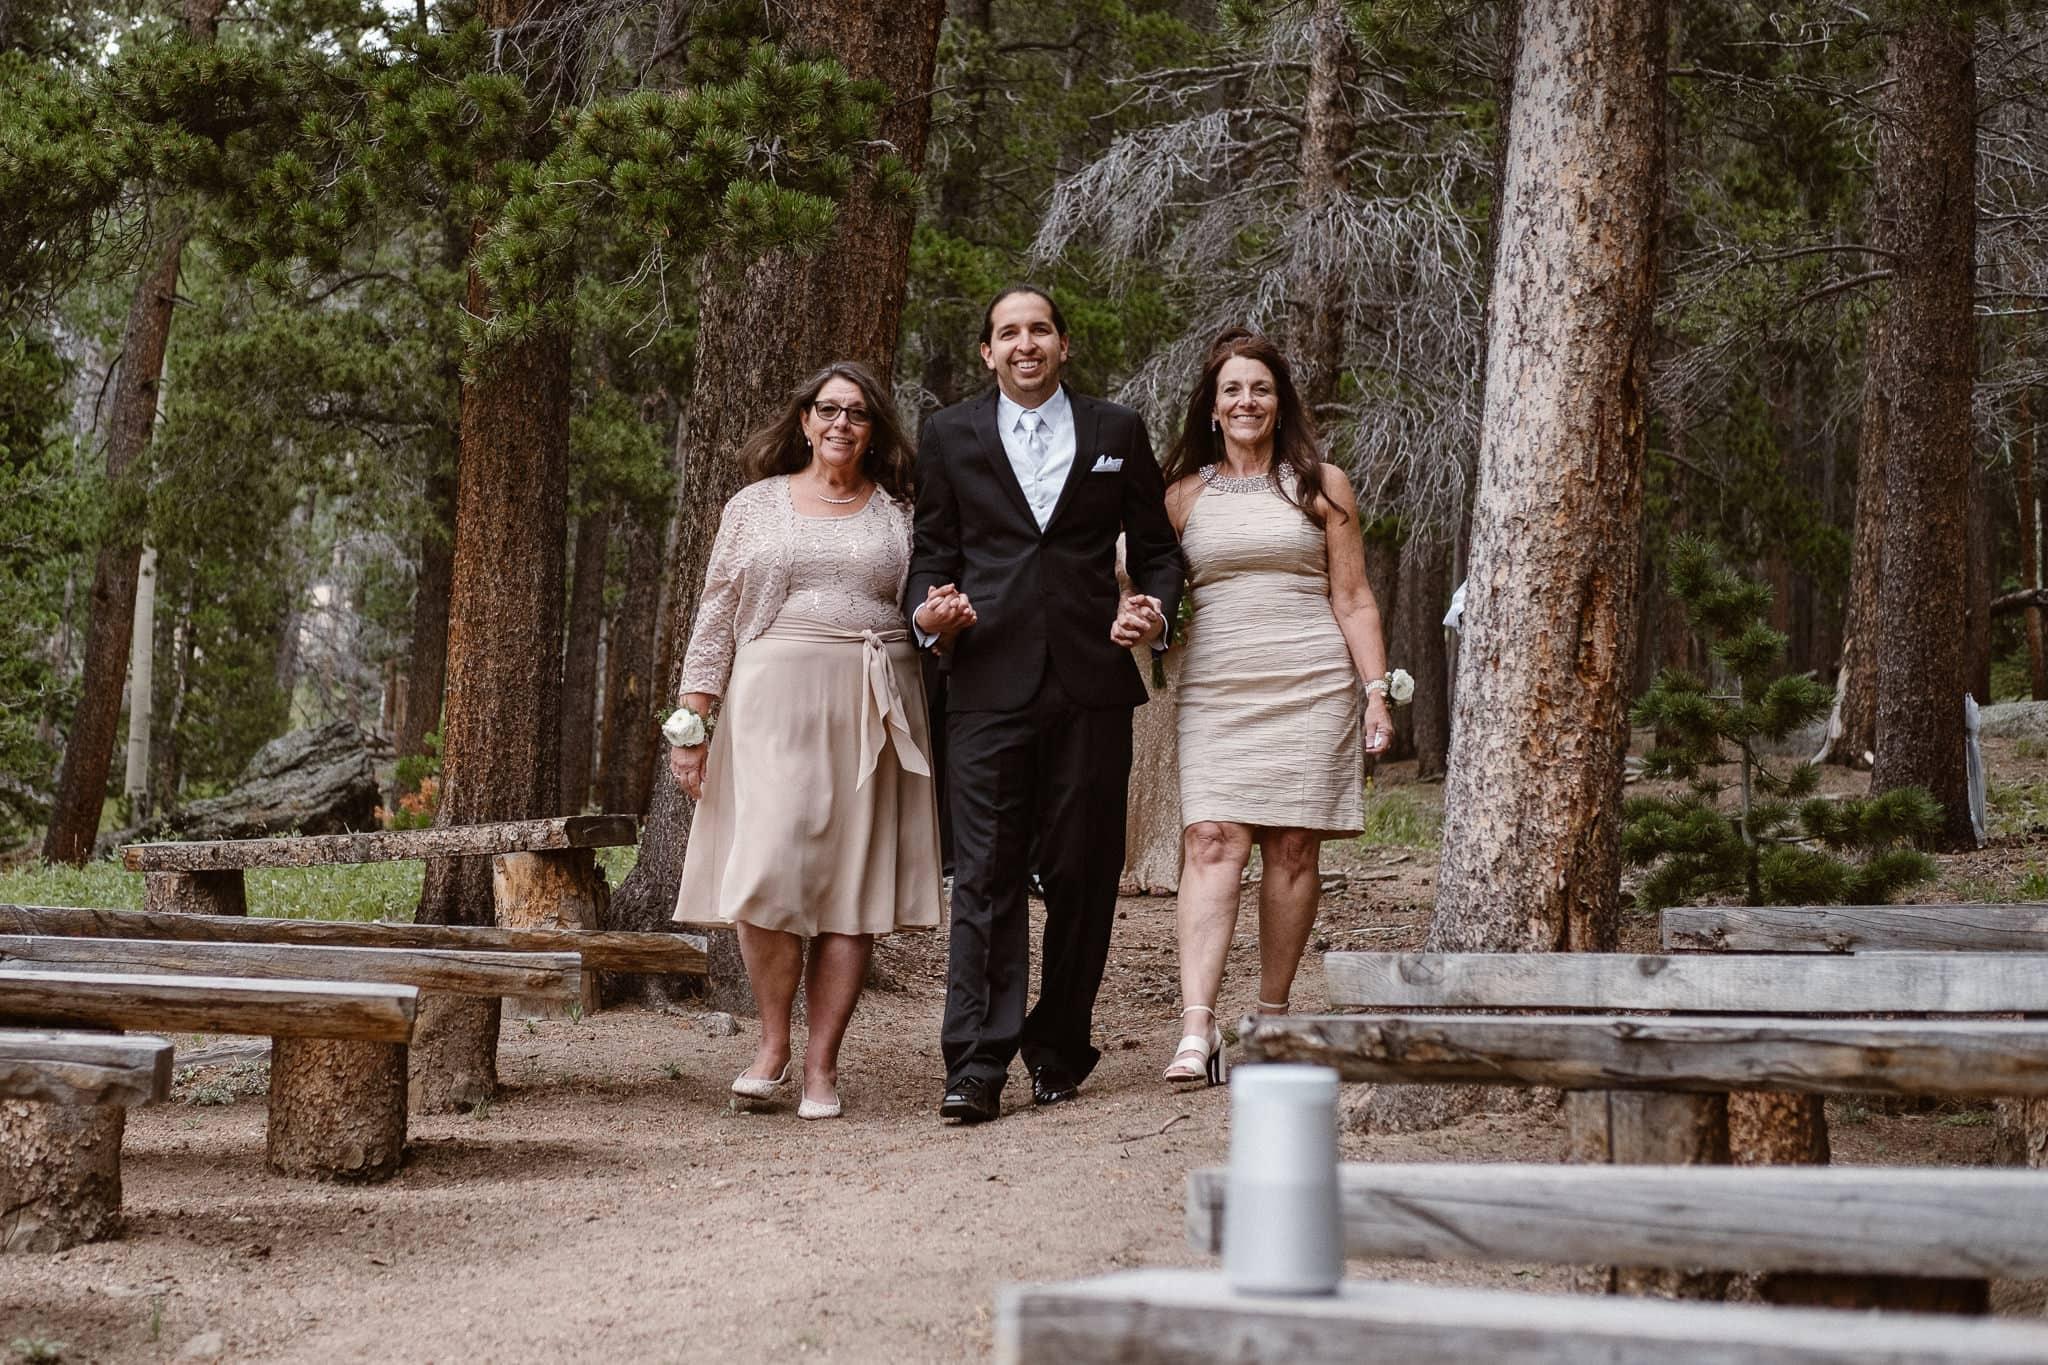 Dao House wedding photographer, Estes Park wedding venue, Colorado mountain wedding, groom walking mothers down the aisle